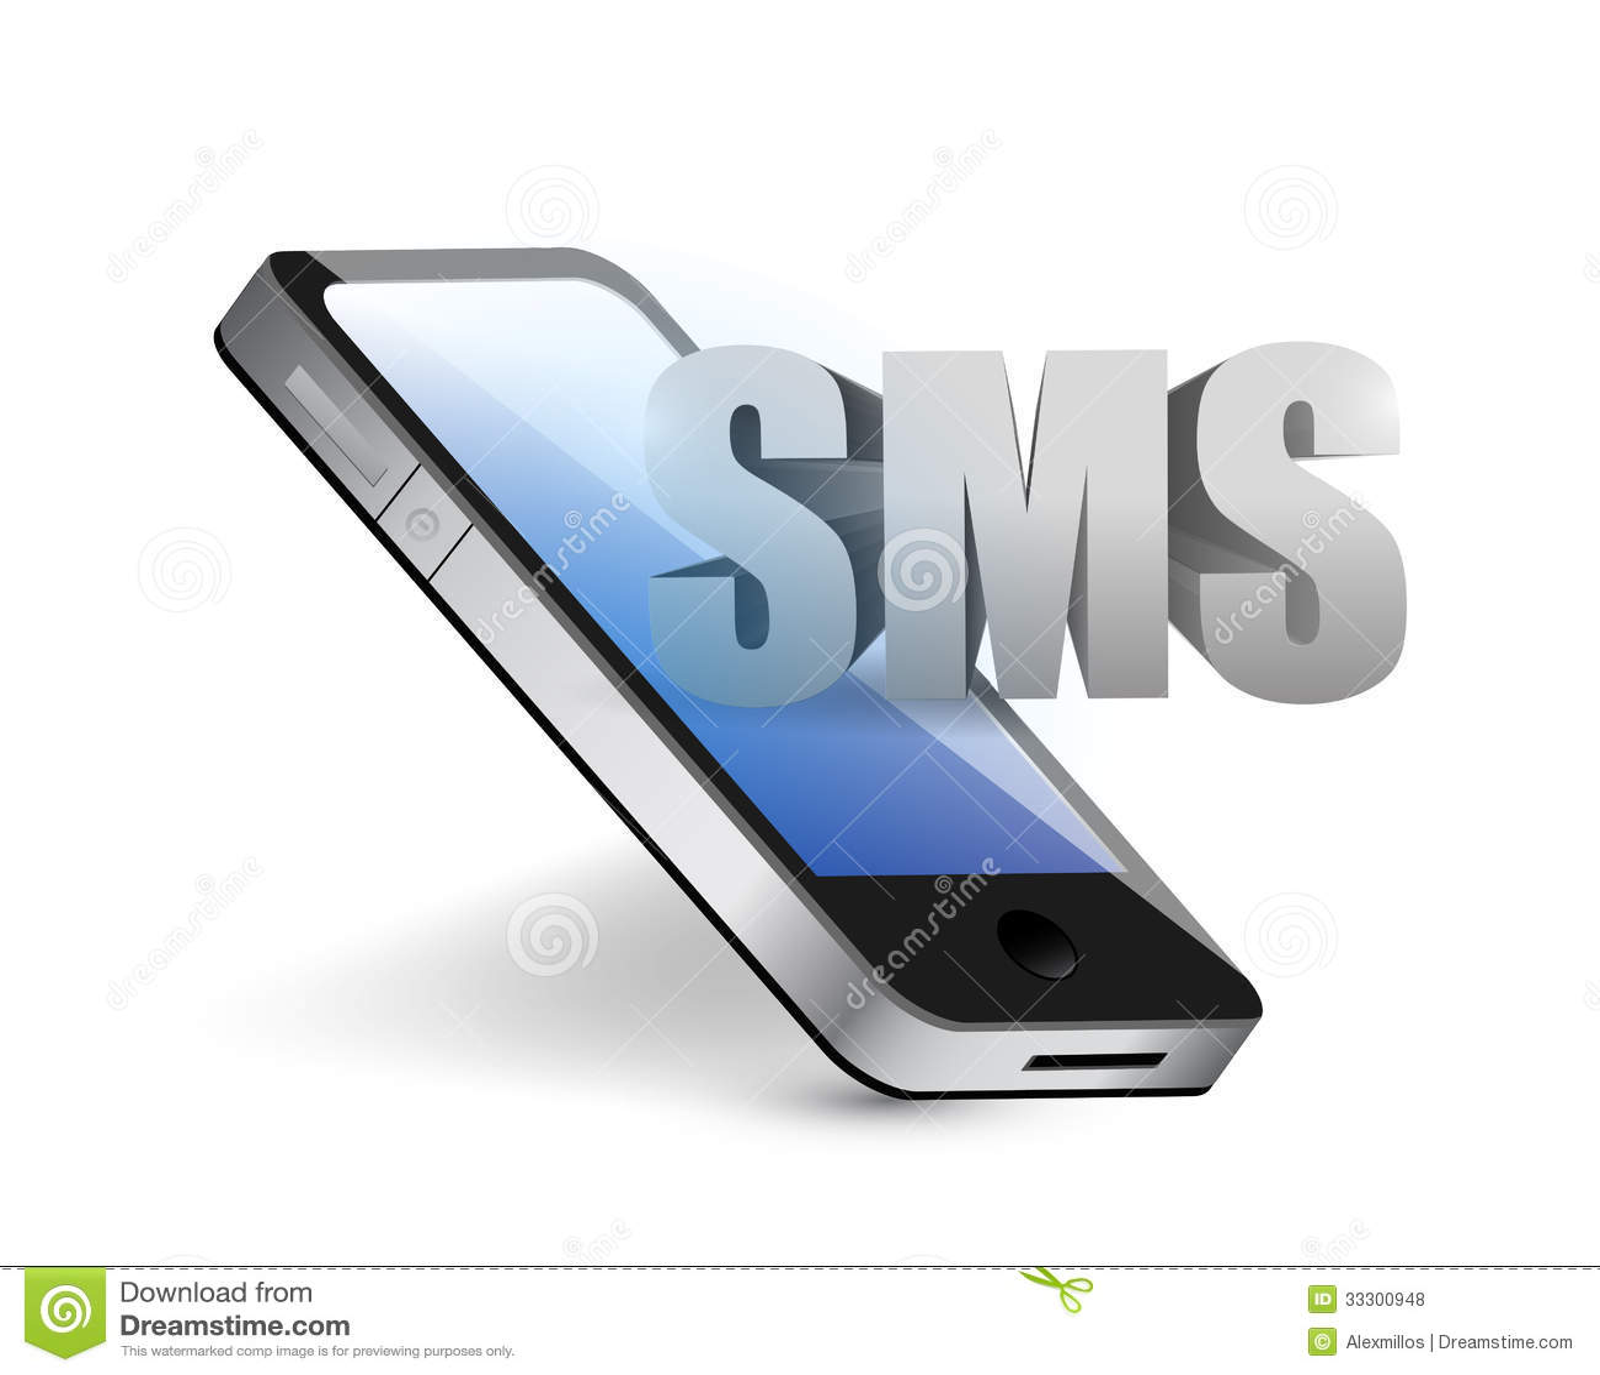 Бесплатная отправка смс от дата-центра ITSOFT!